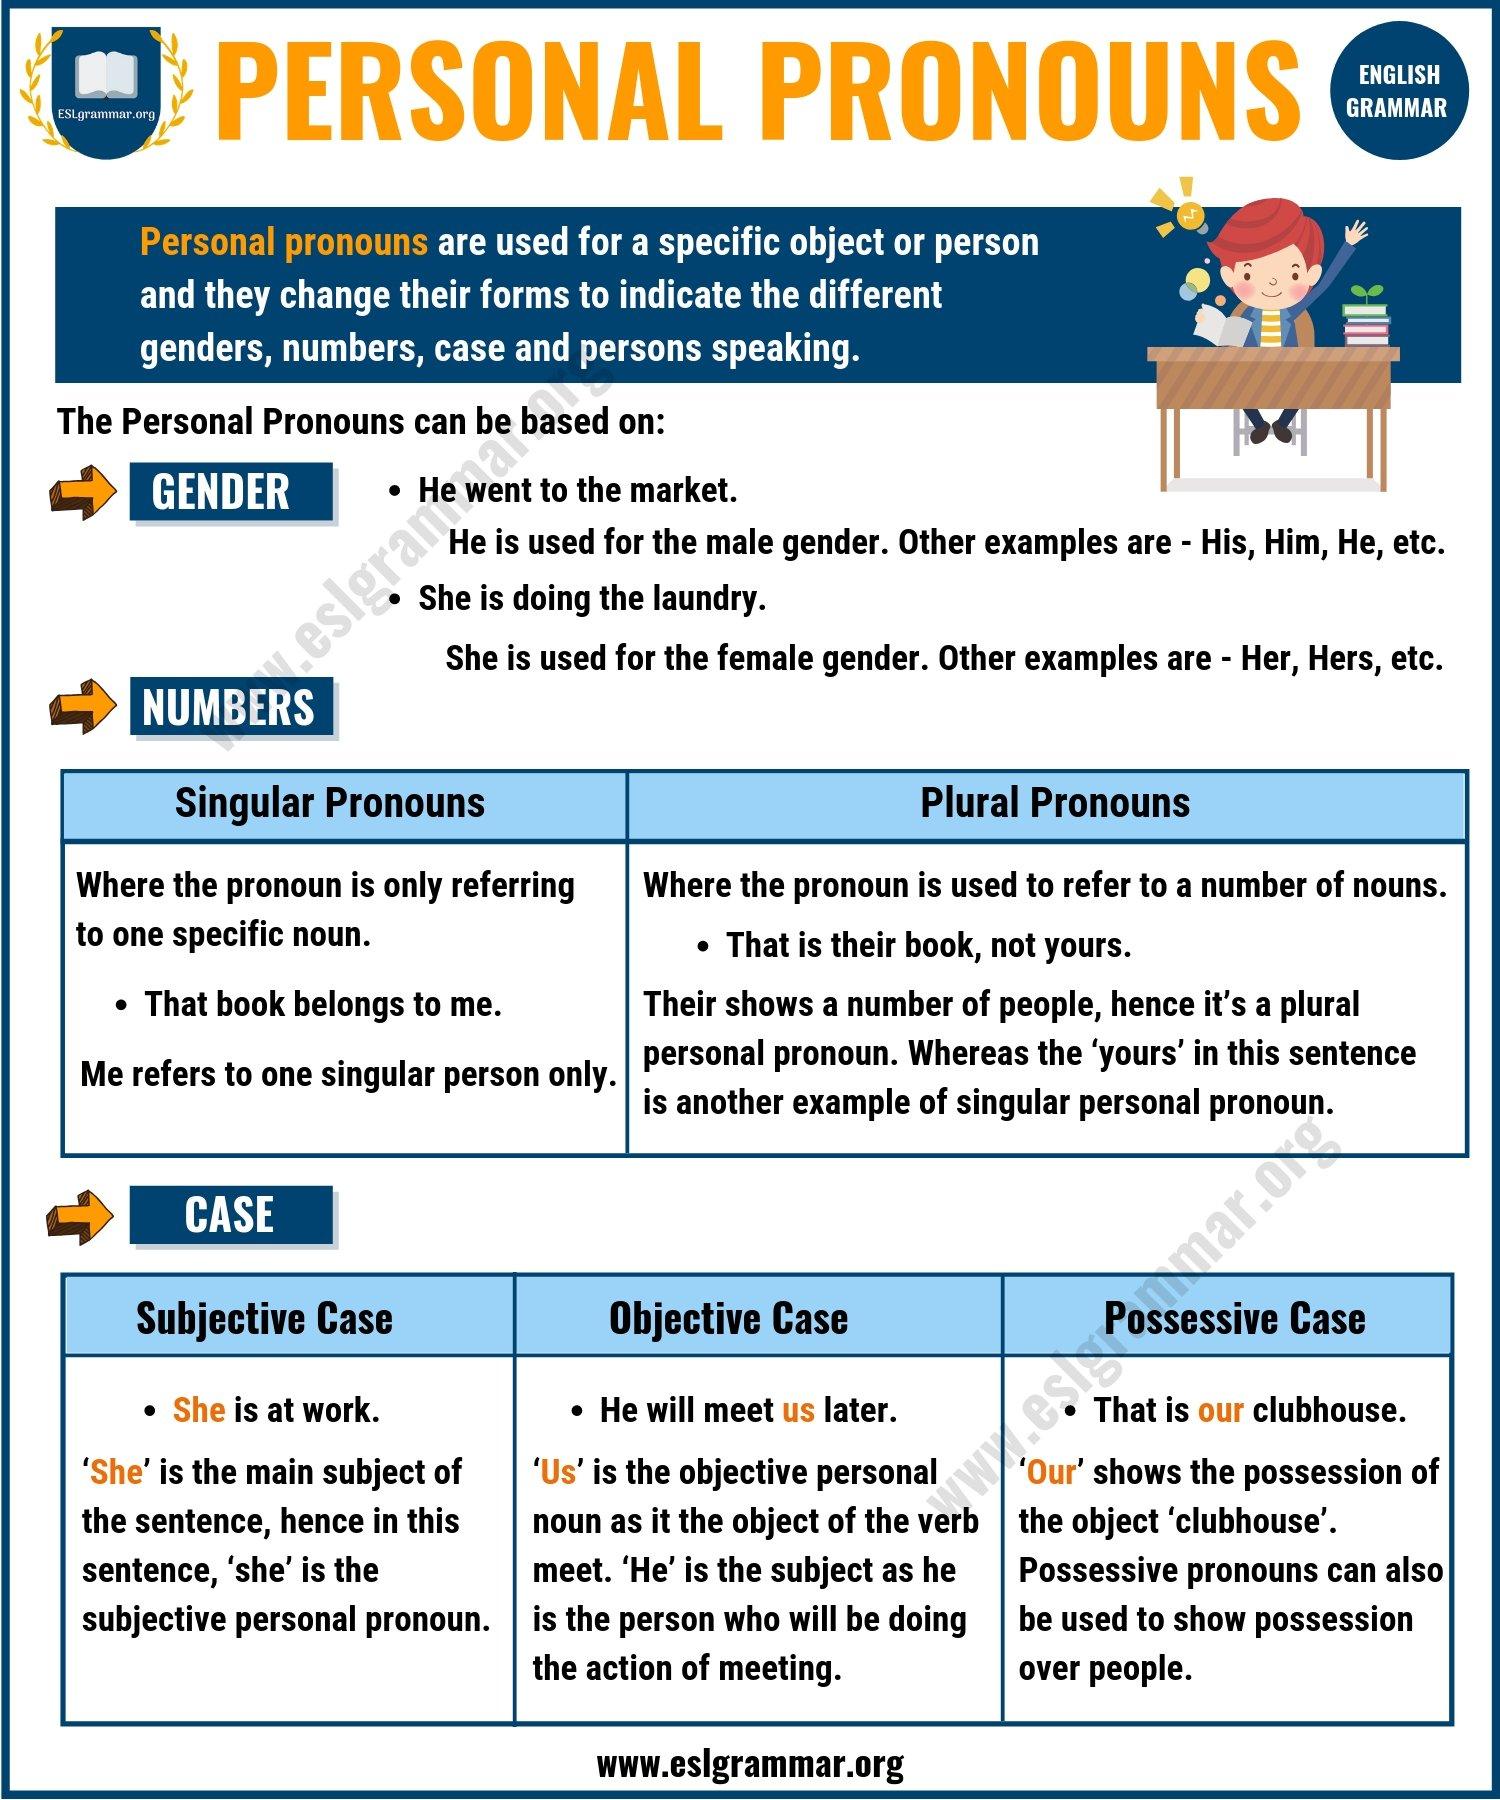 pronouns personal types pronoun examples english grammar esl demonstrative exercises infographic